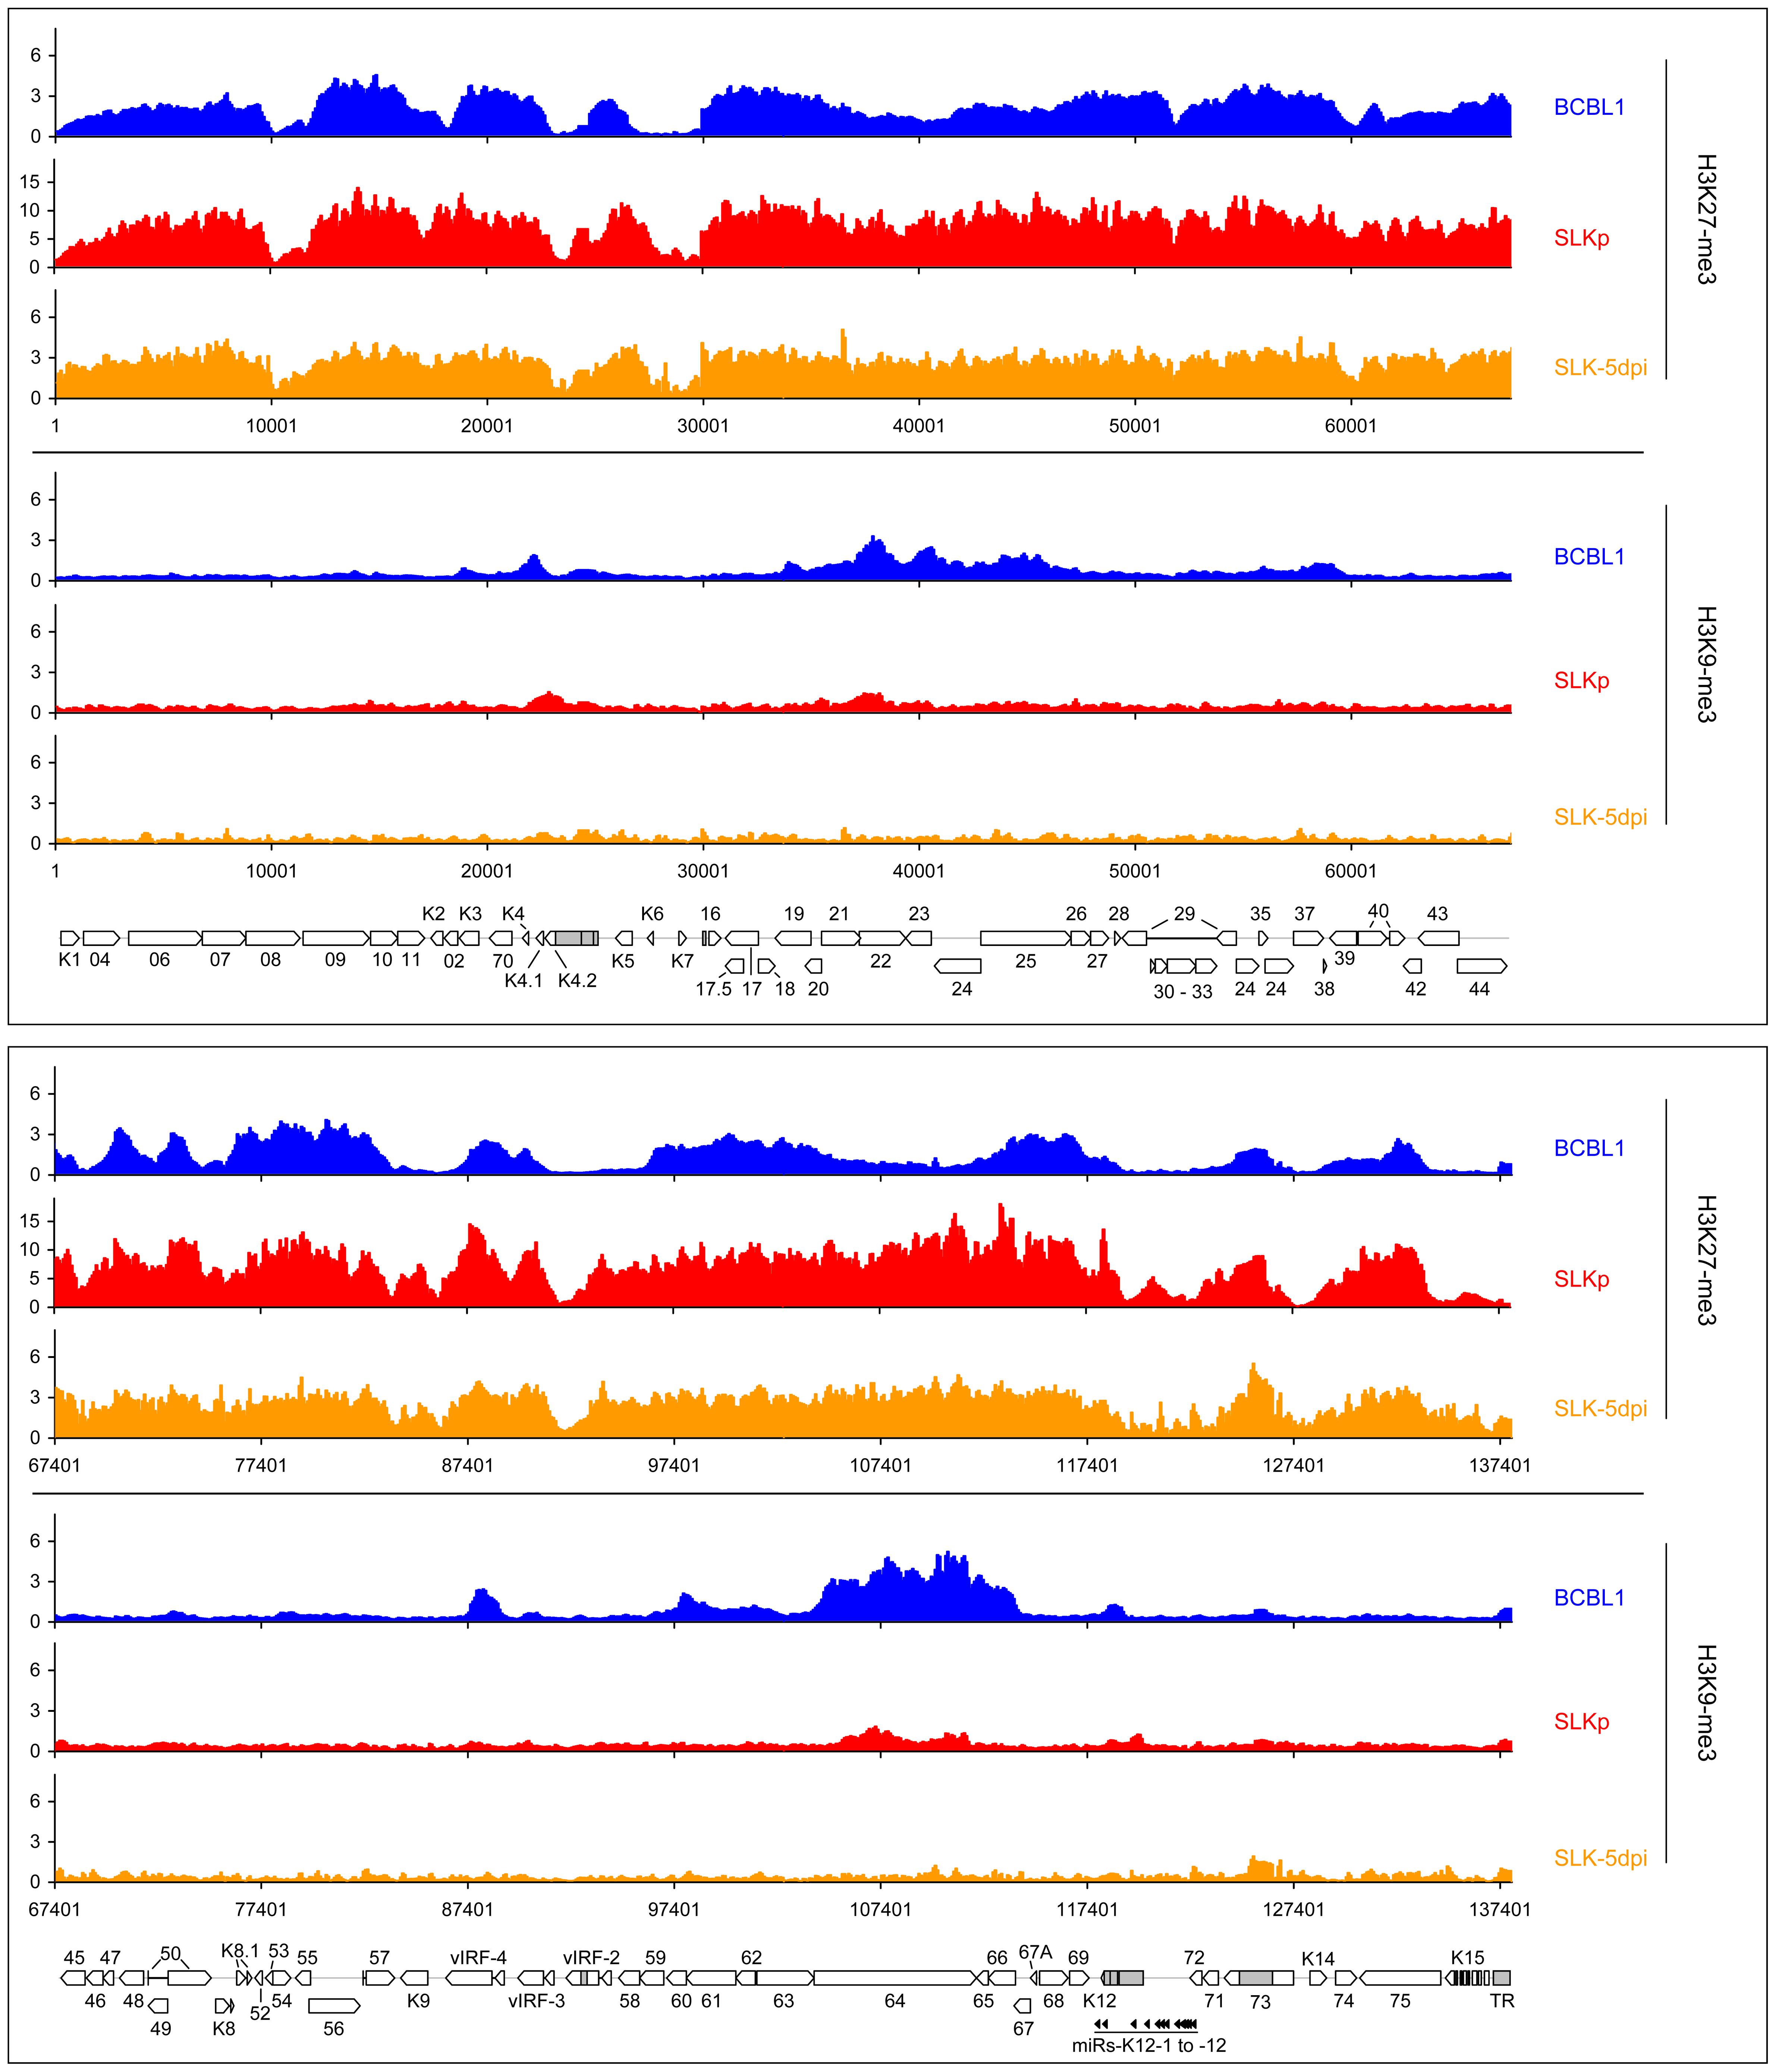 Global patterns of H3K27 and H3K9 tri-methylation on latent KSHV genomes.